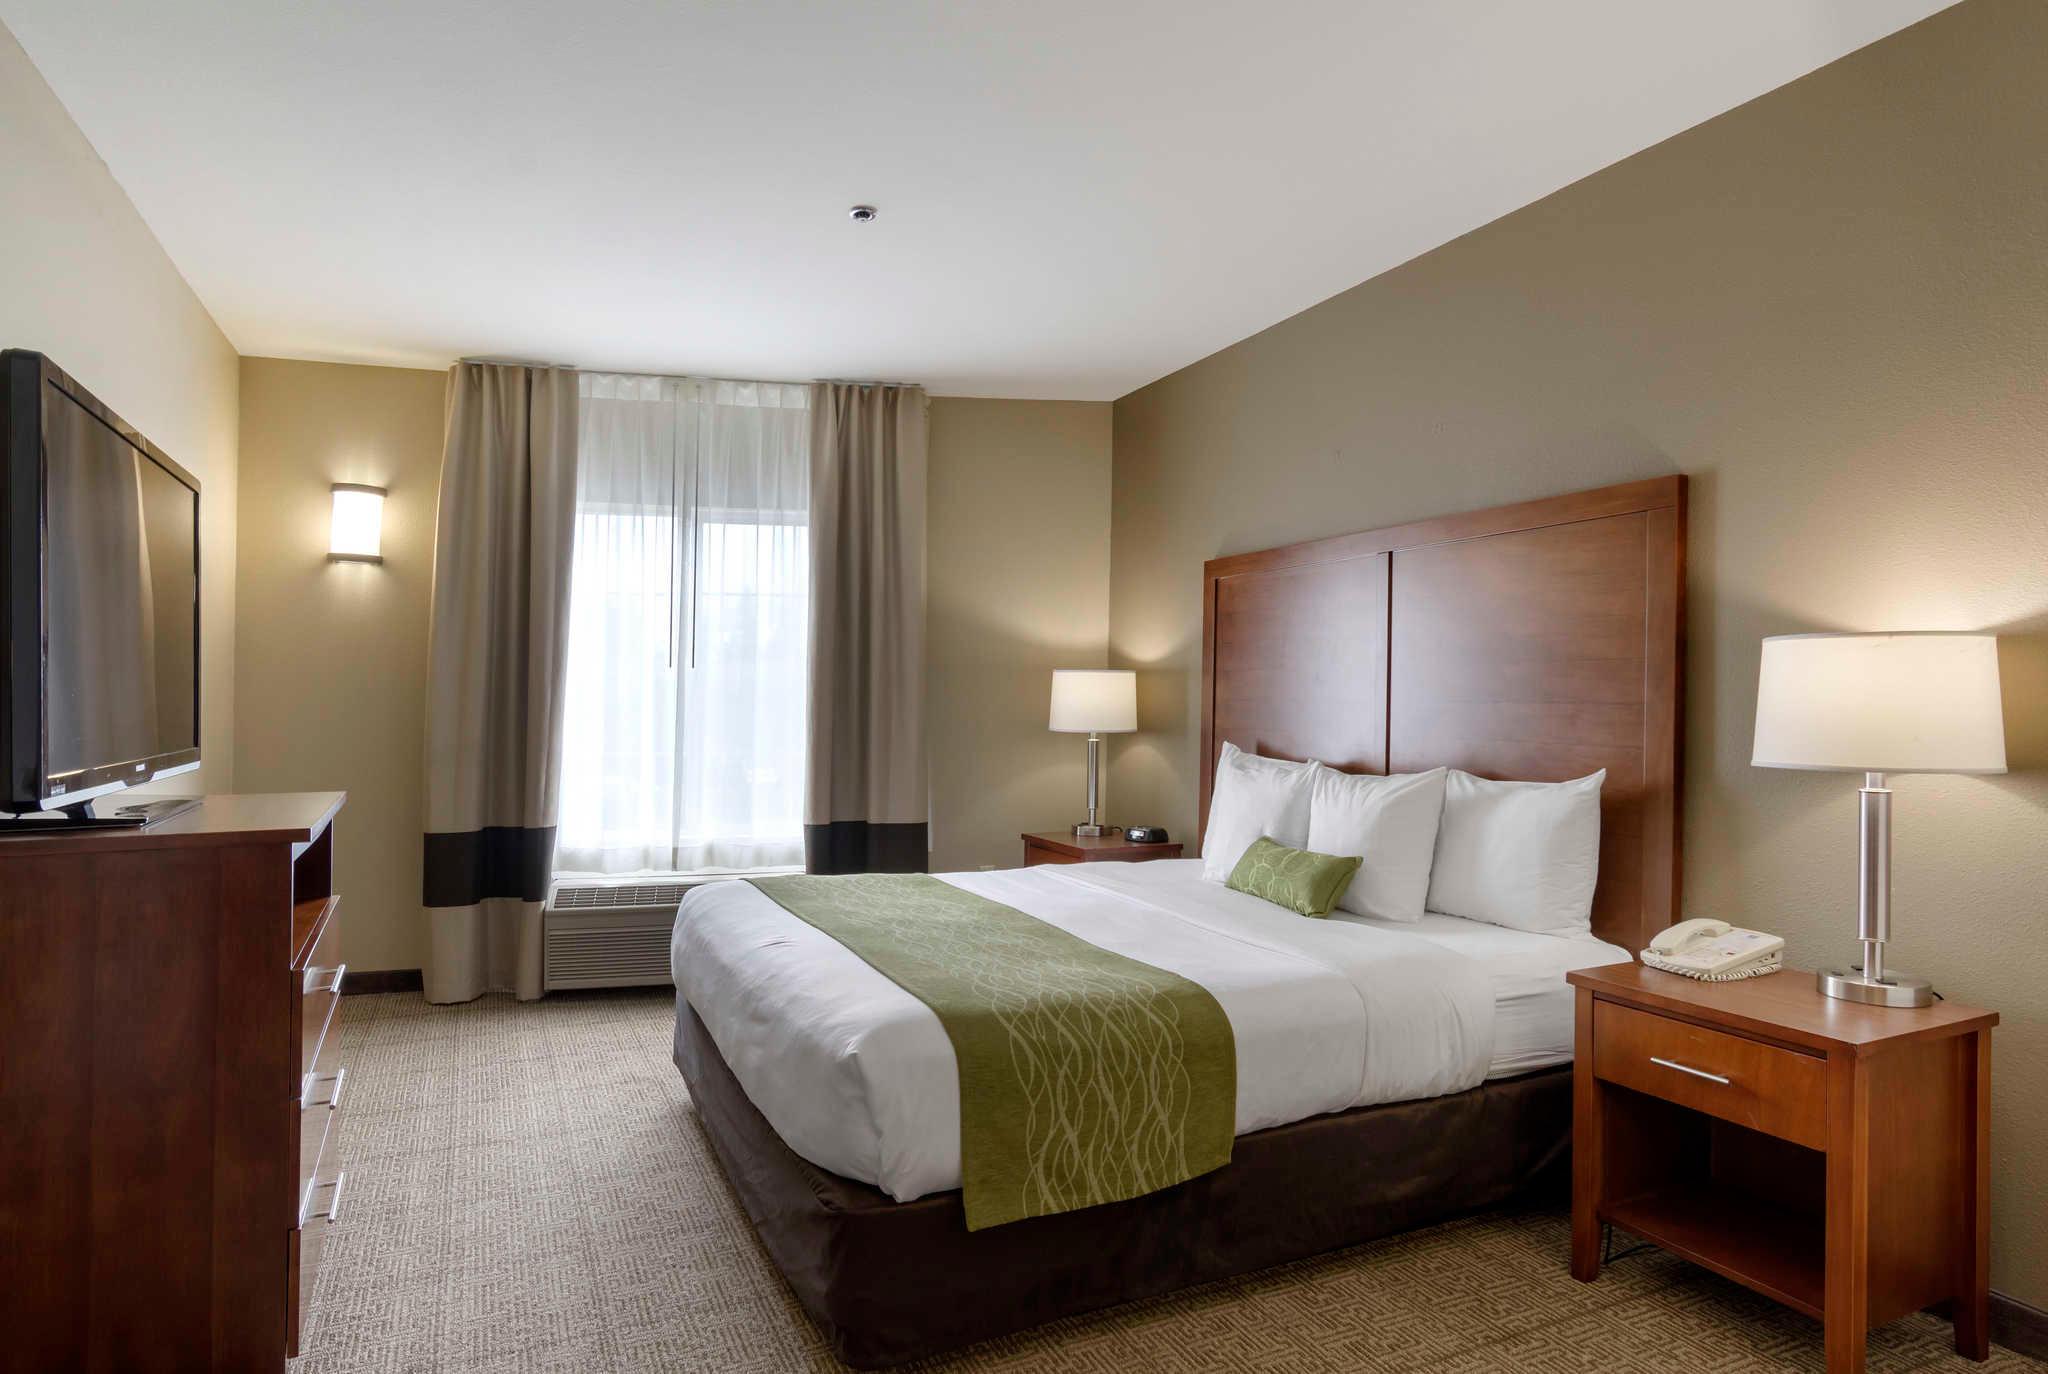 Comfort Inn & Suites Sacramento - University Area image 2